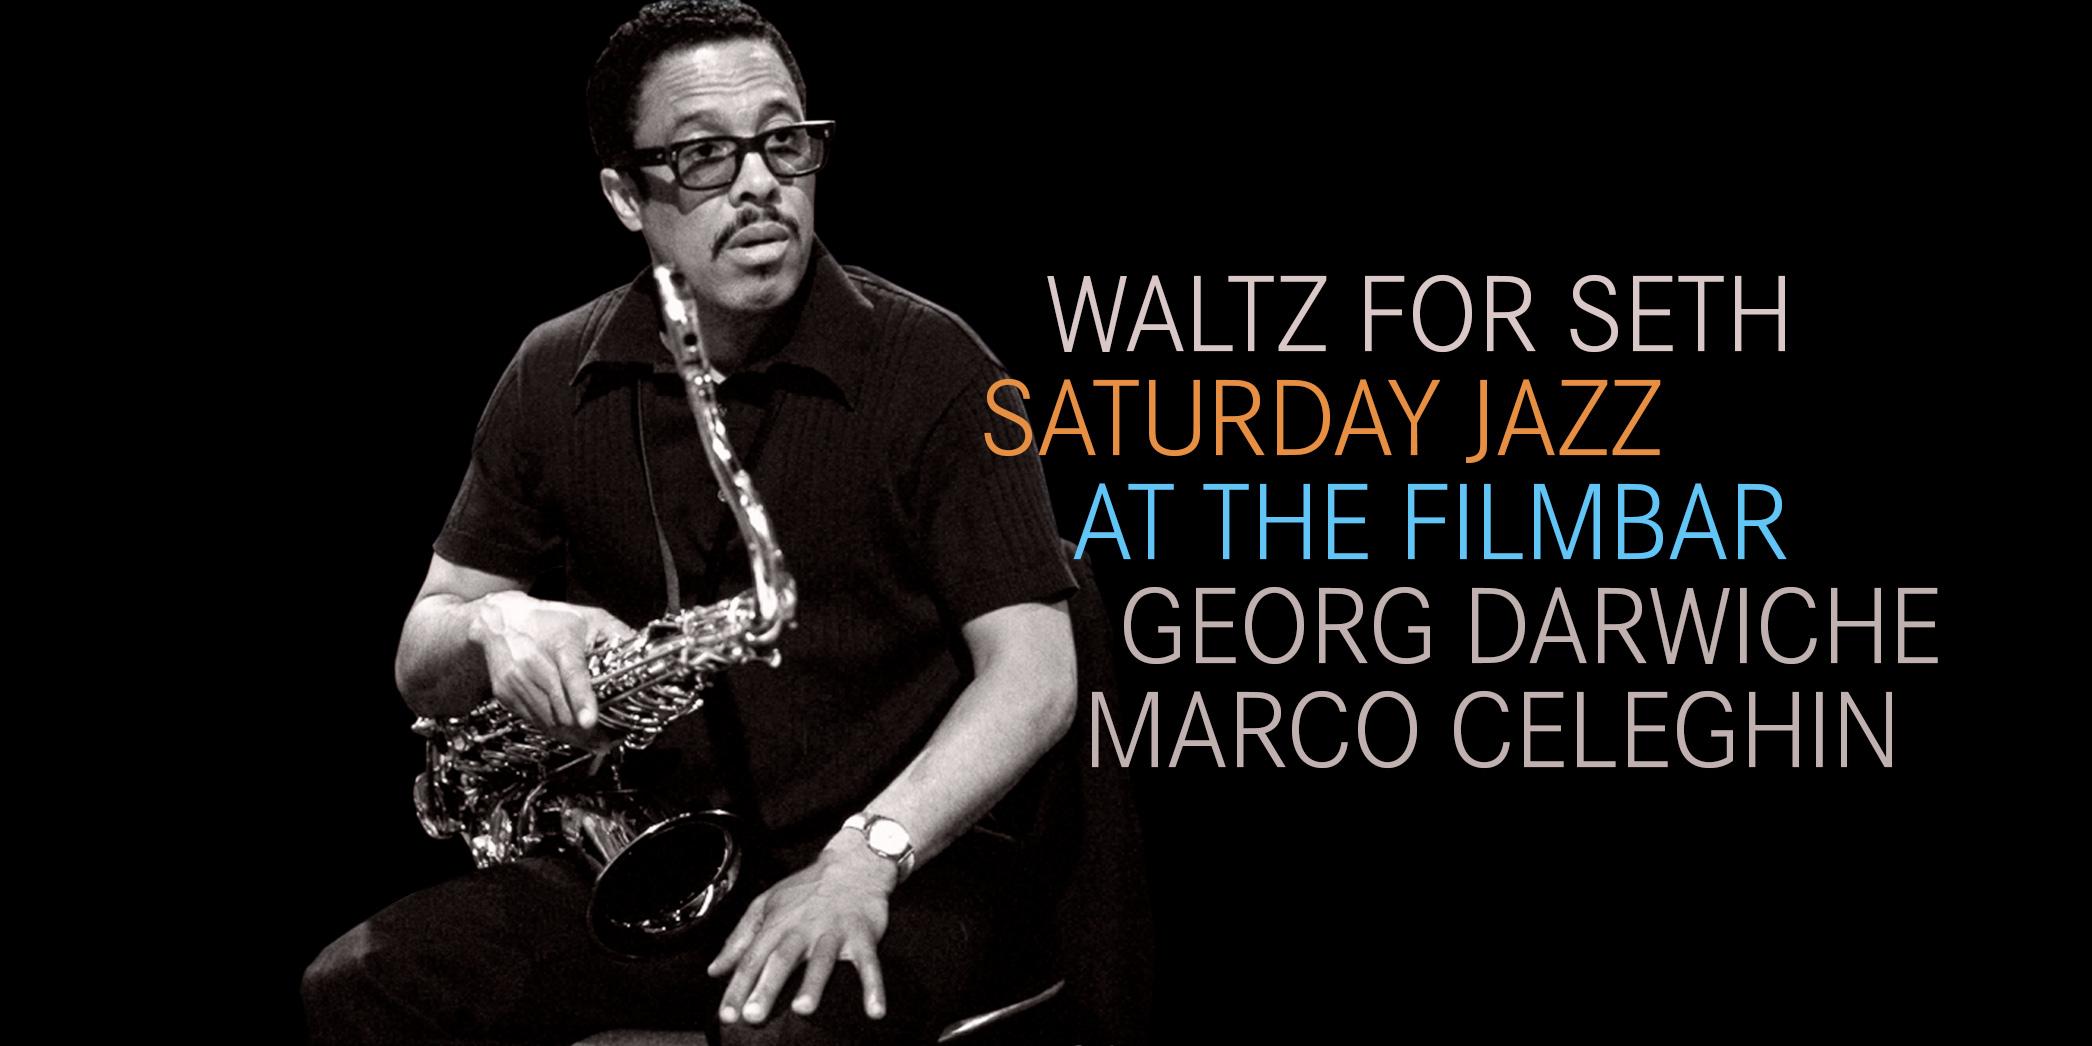 Saturday-Jazz-at-The-Filmbar_darwiche+celeghin_fb_20170902_